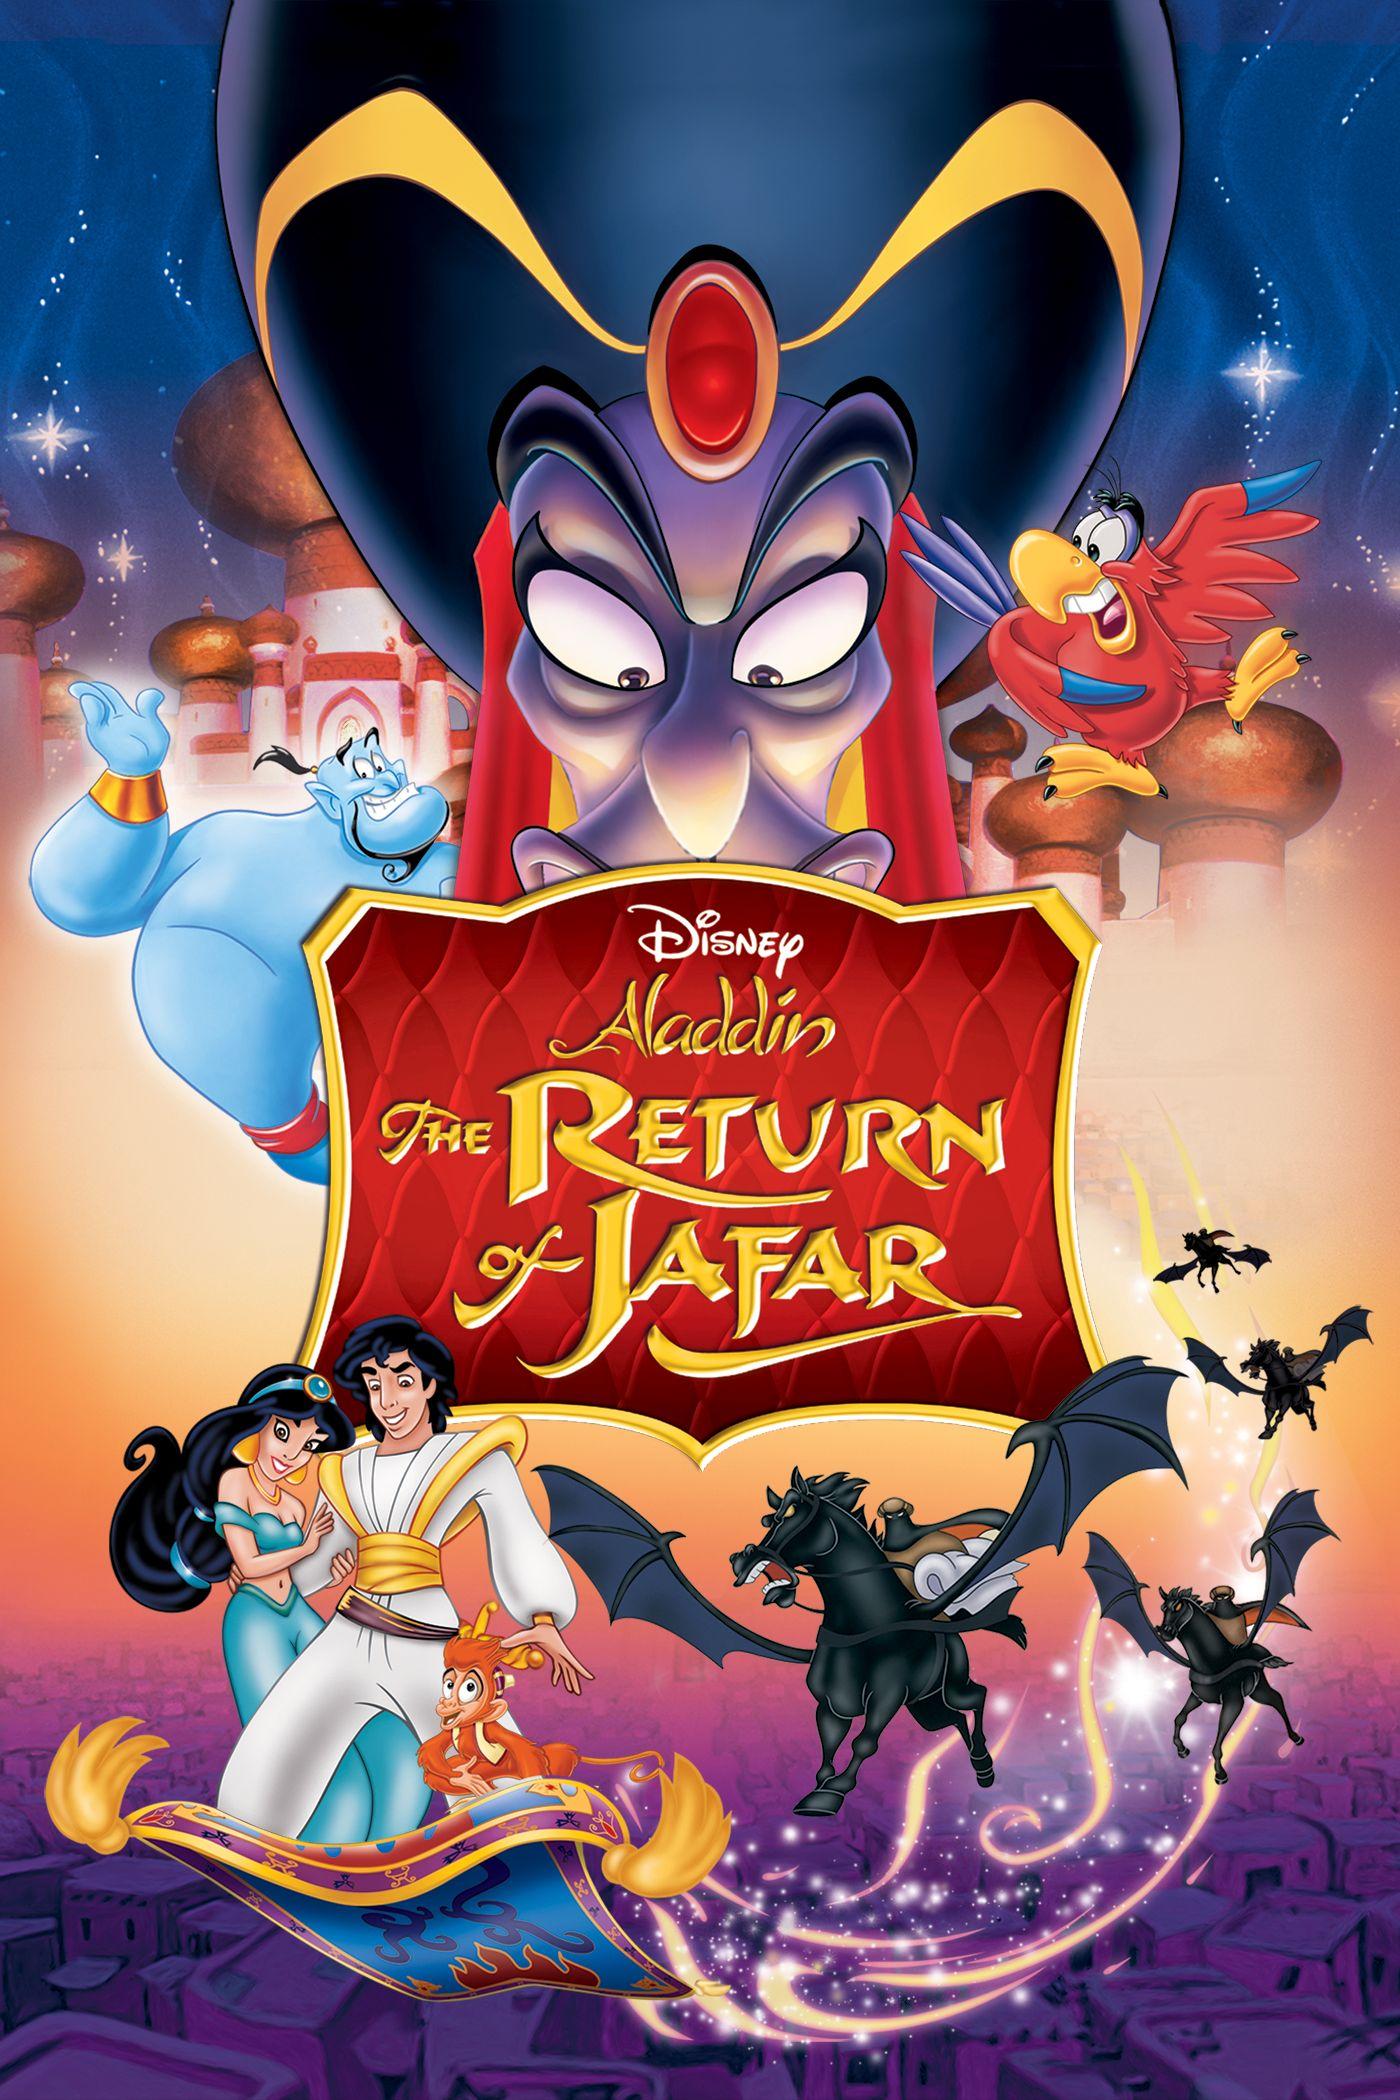 Aladdin: The Return of Jafar (1994) Dual Audio 720p WEBRip [Hindi-English] 620MB